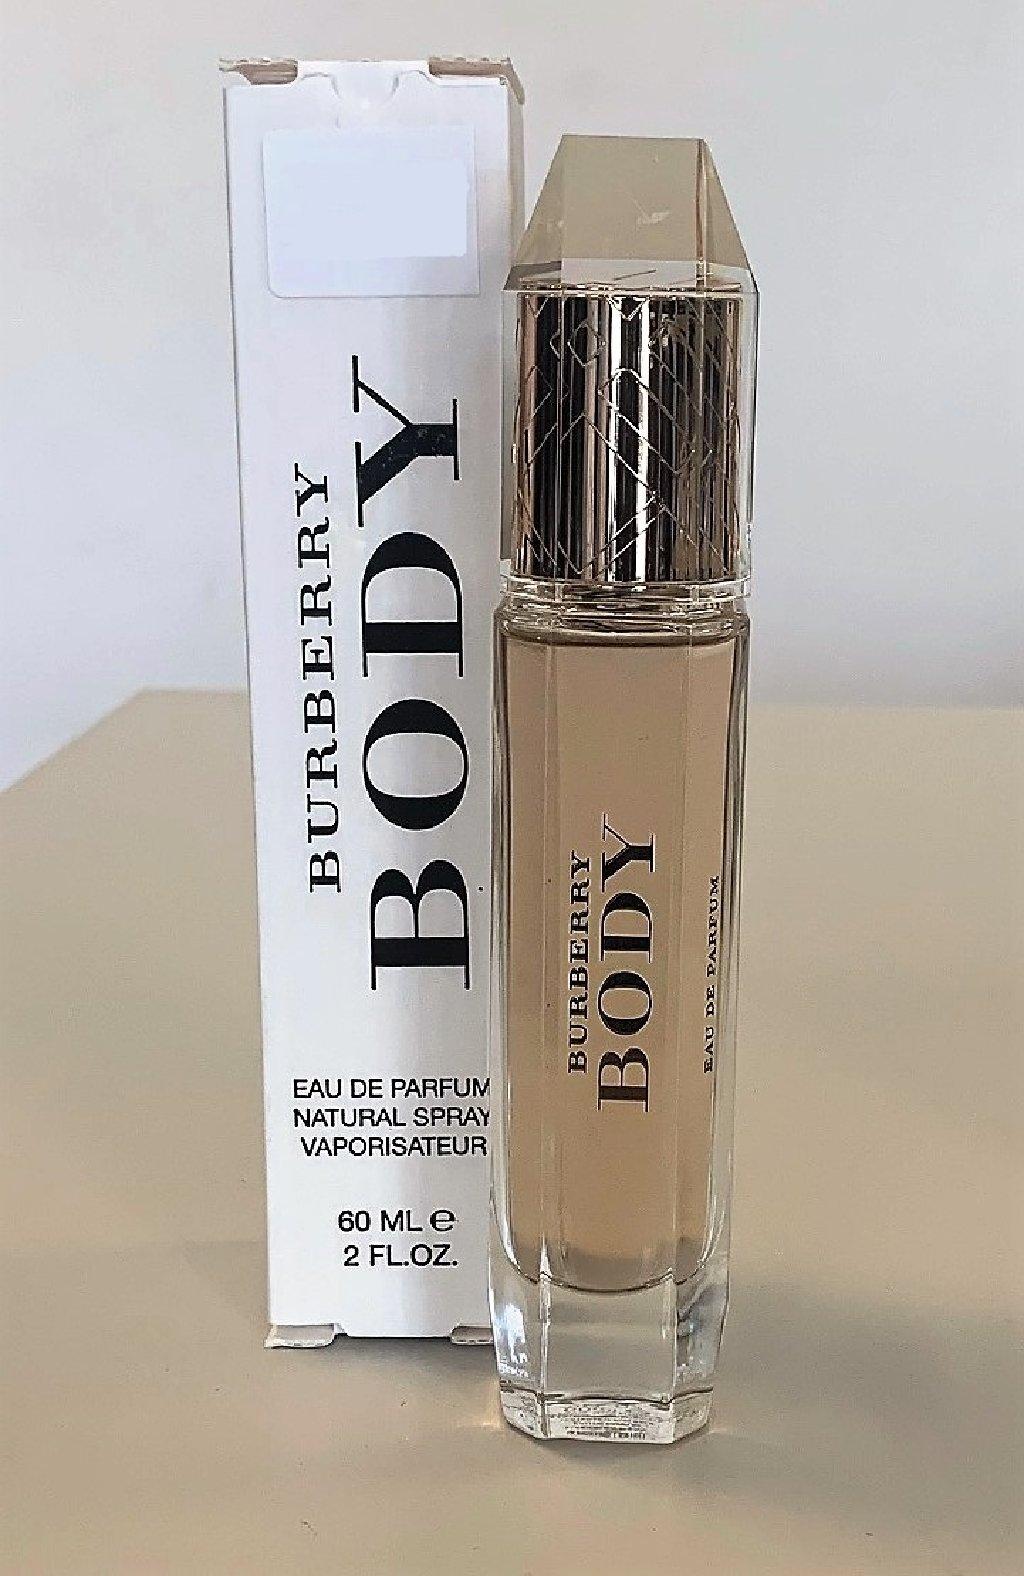 Burberry Body EDP 60ml. Γυναικείο άρωμα, αυθεντικό και αχρησιμοποίητο